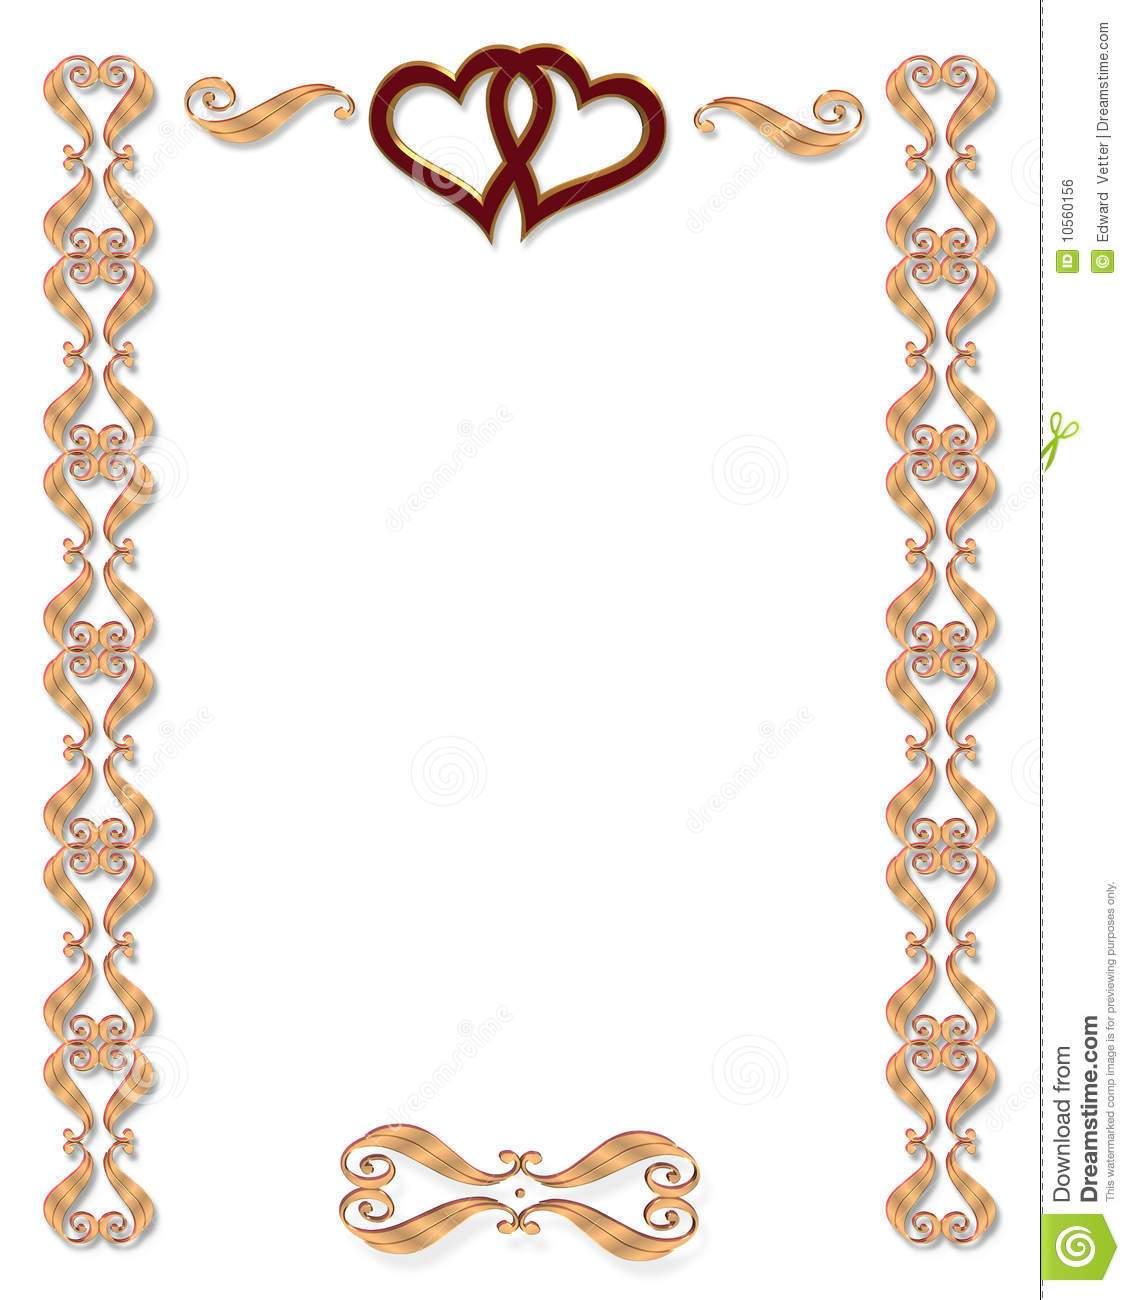 1130x1300 Wedding Invitation Borders Clip Art Free Images